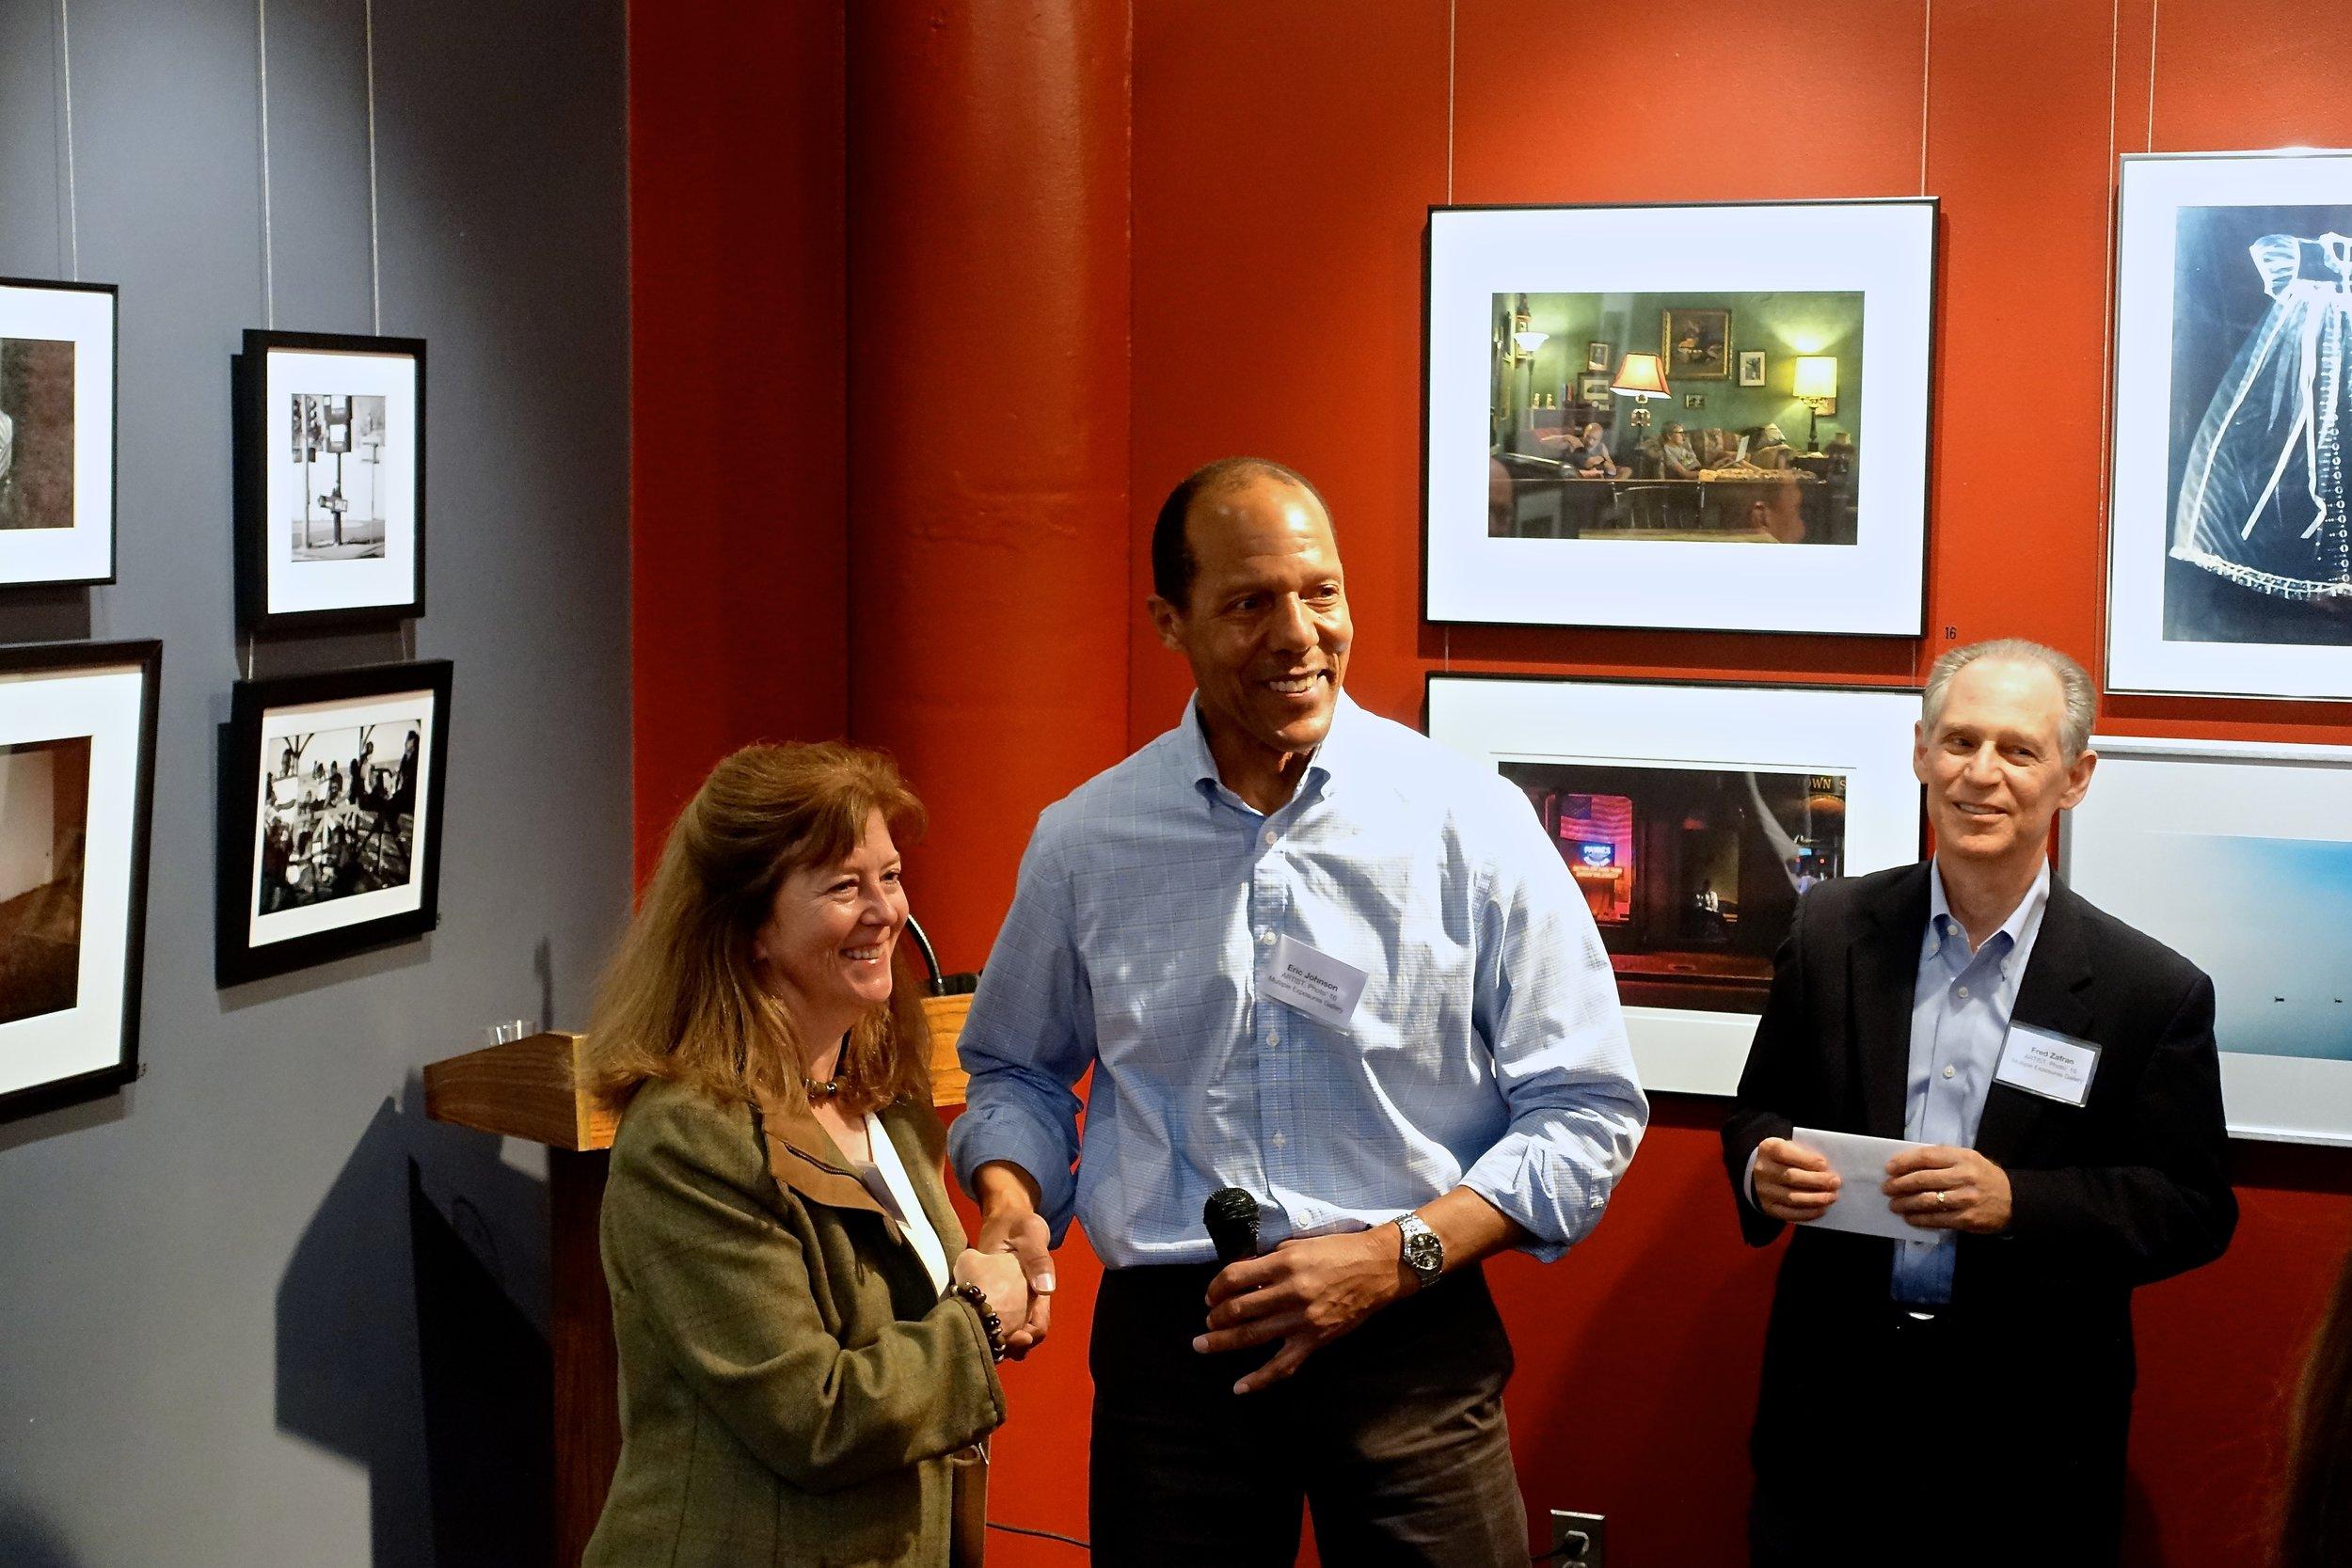 Sarah Salomon with MEG members Eric Johnson and Fred Zafran